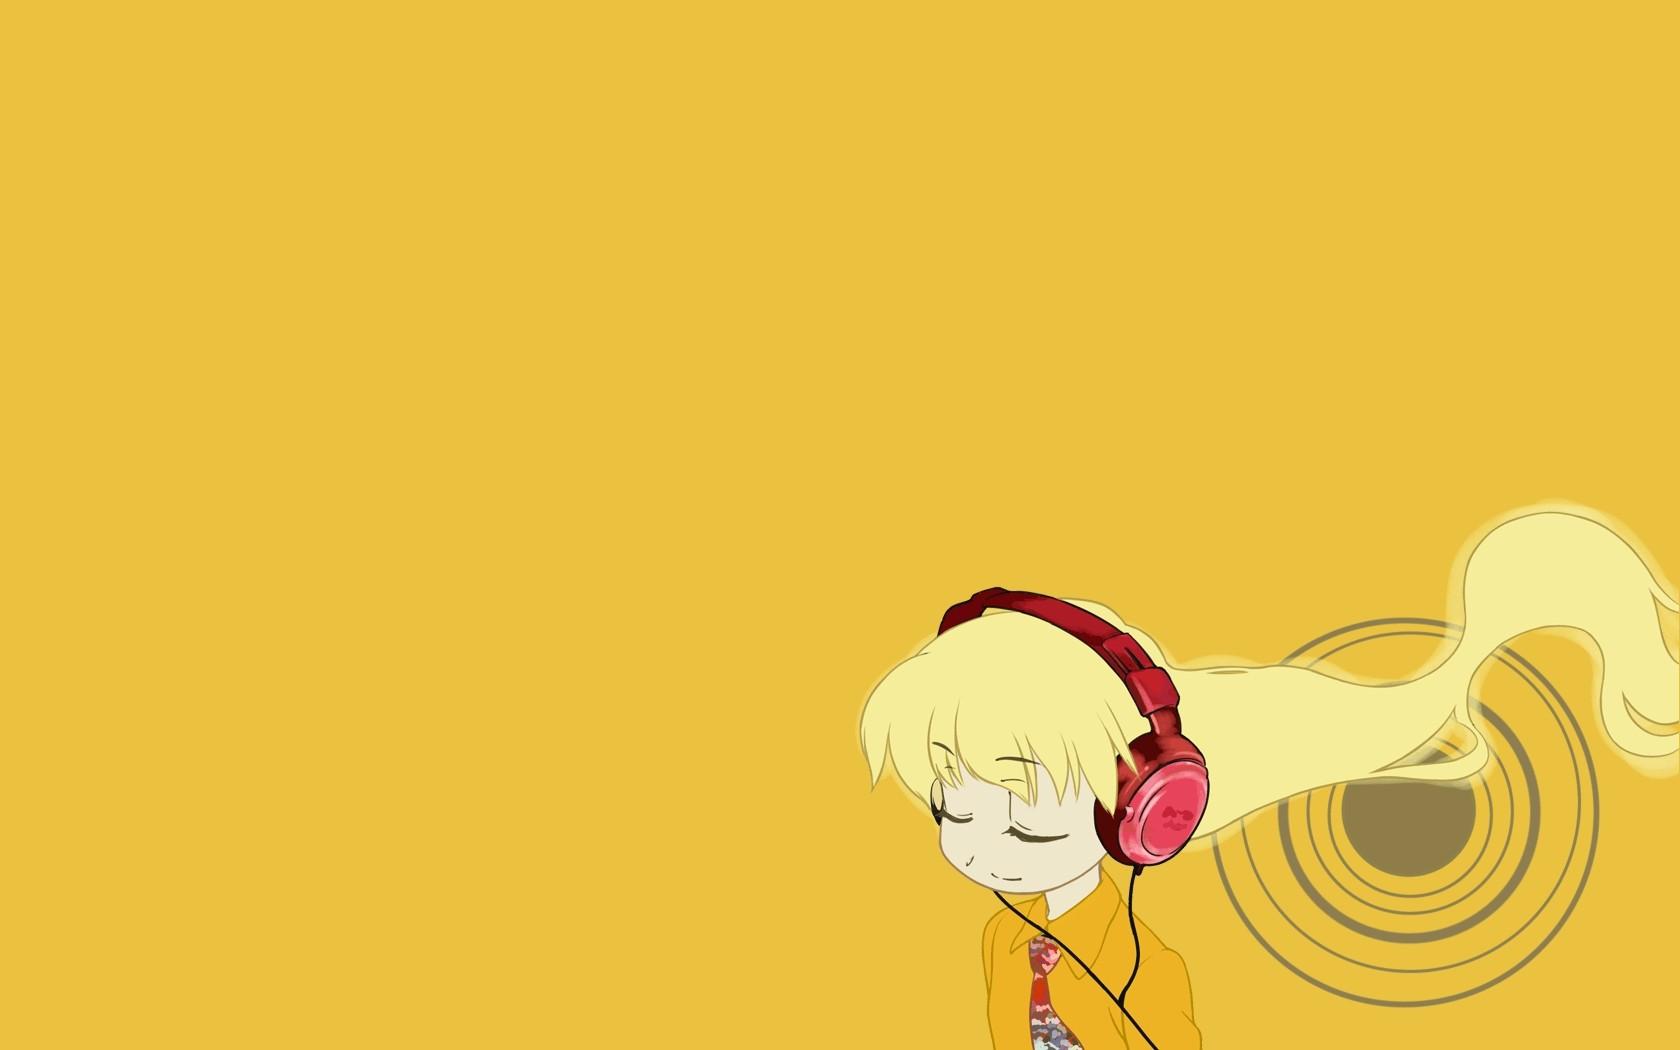 headphones pani_poni_dash rebecca_miyamoto yellow